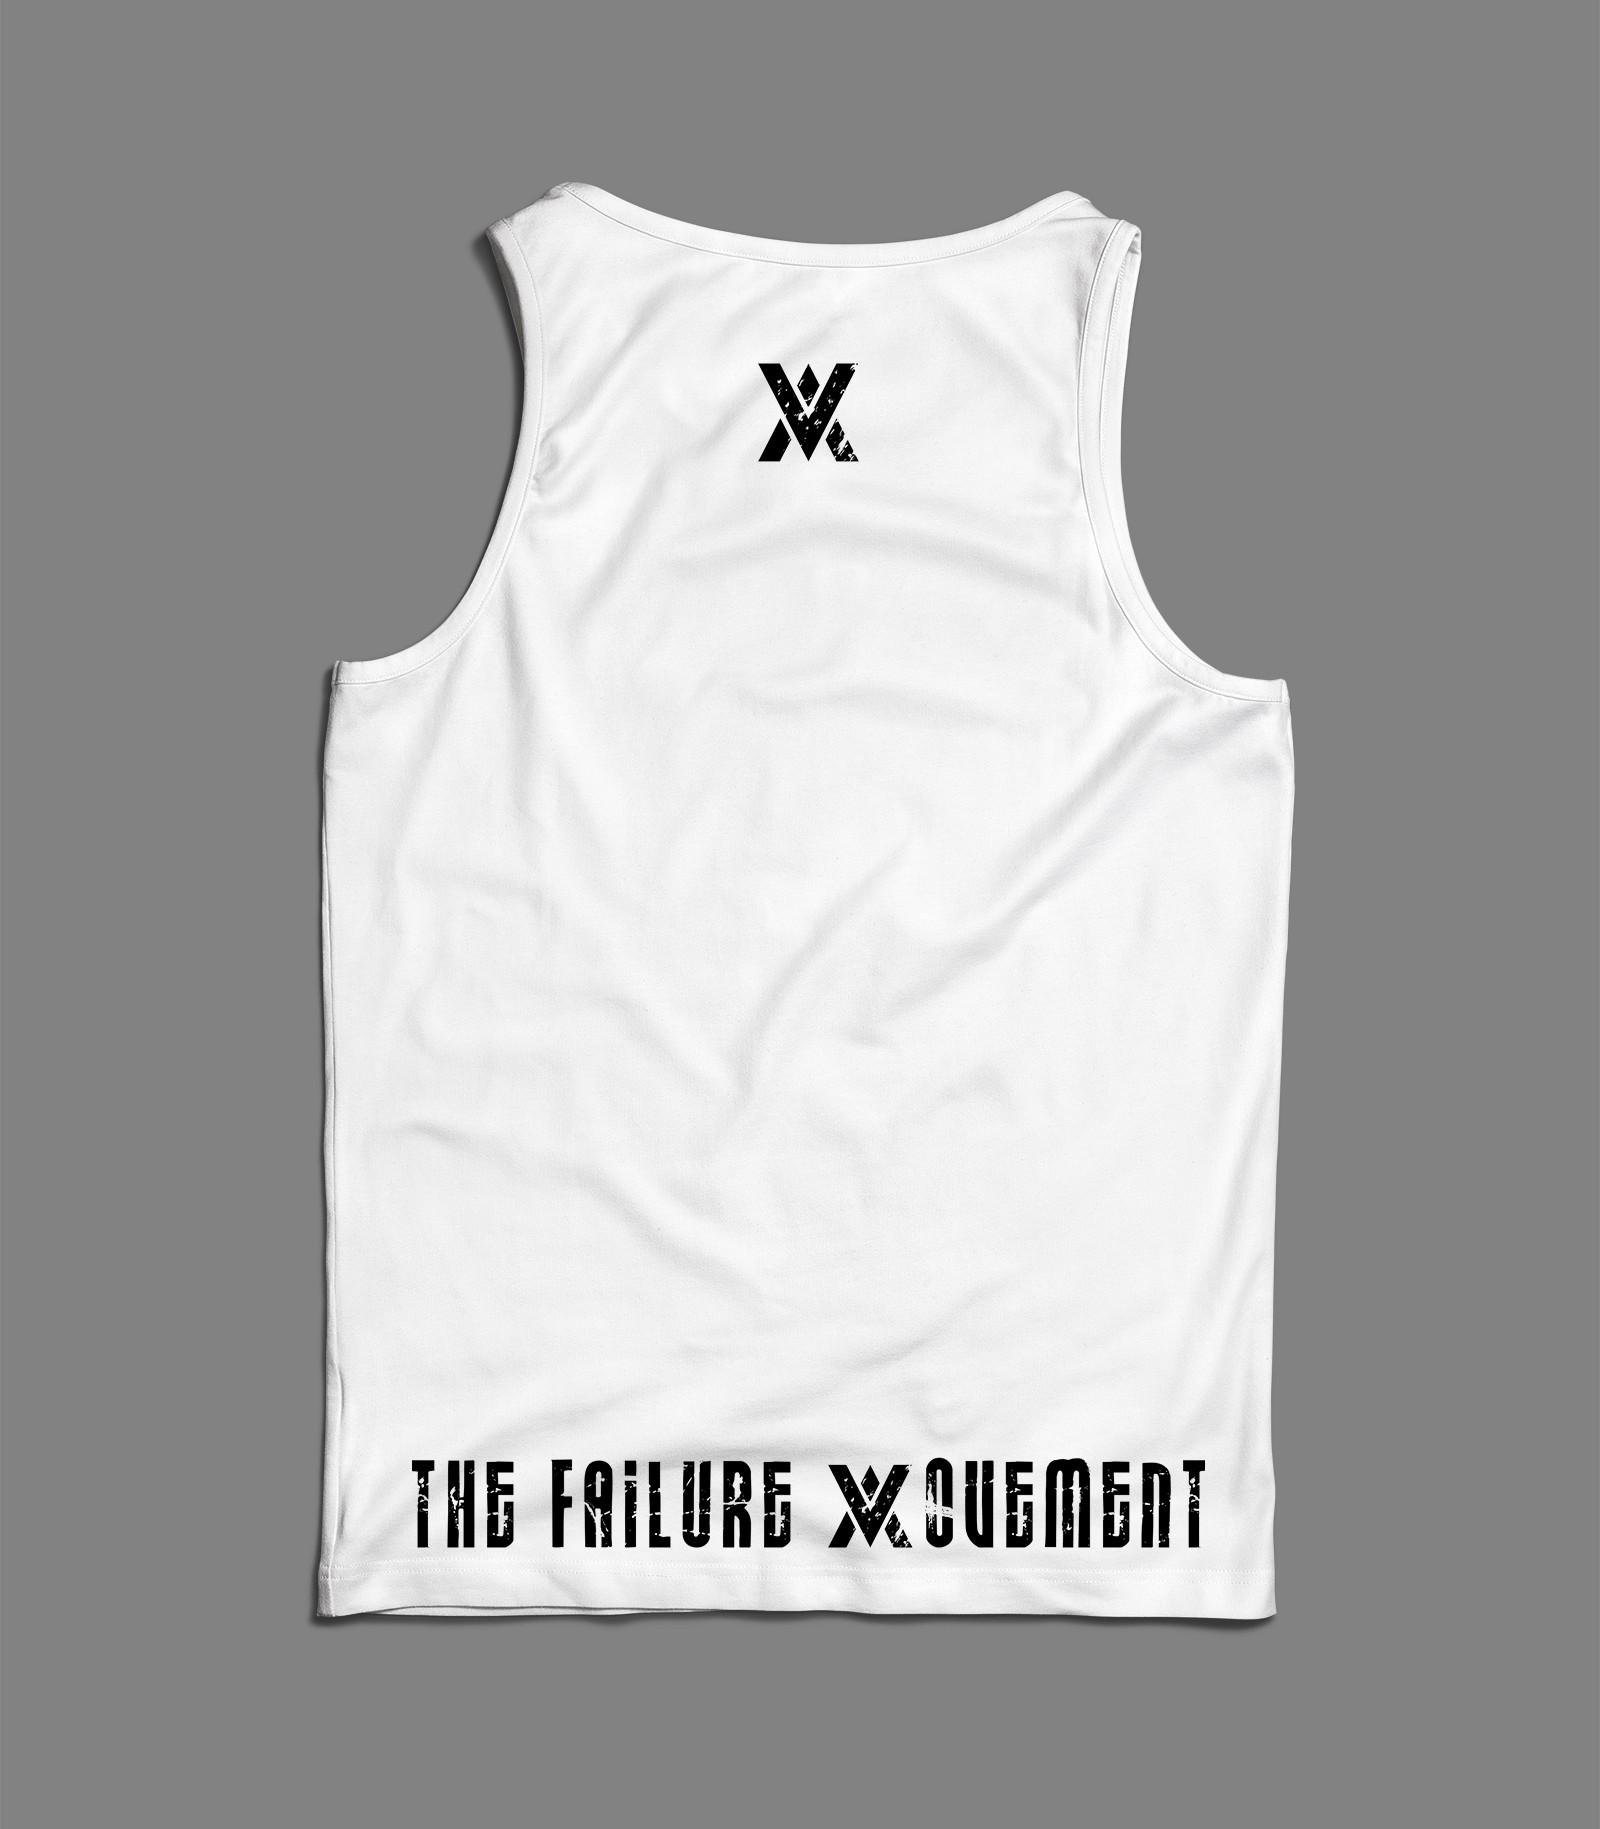 Cool and unique tshirt design